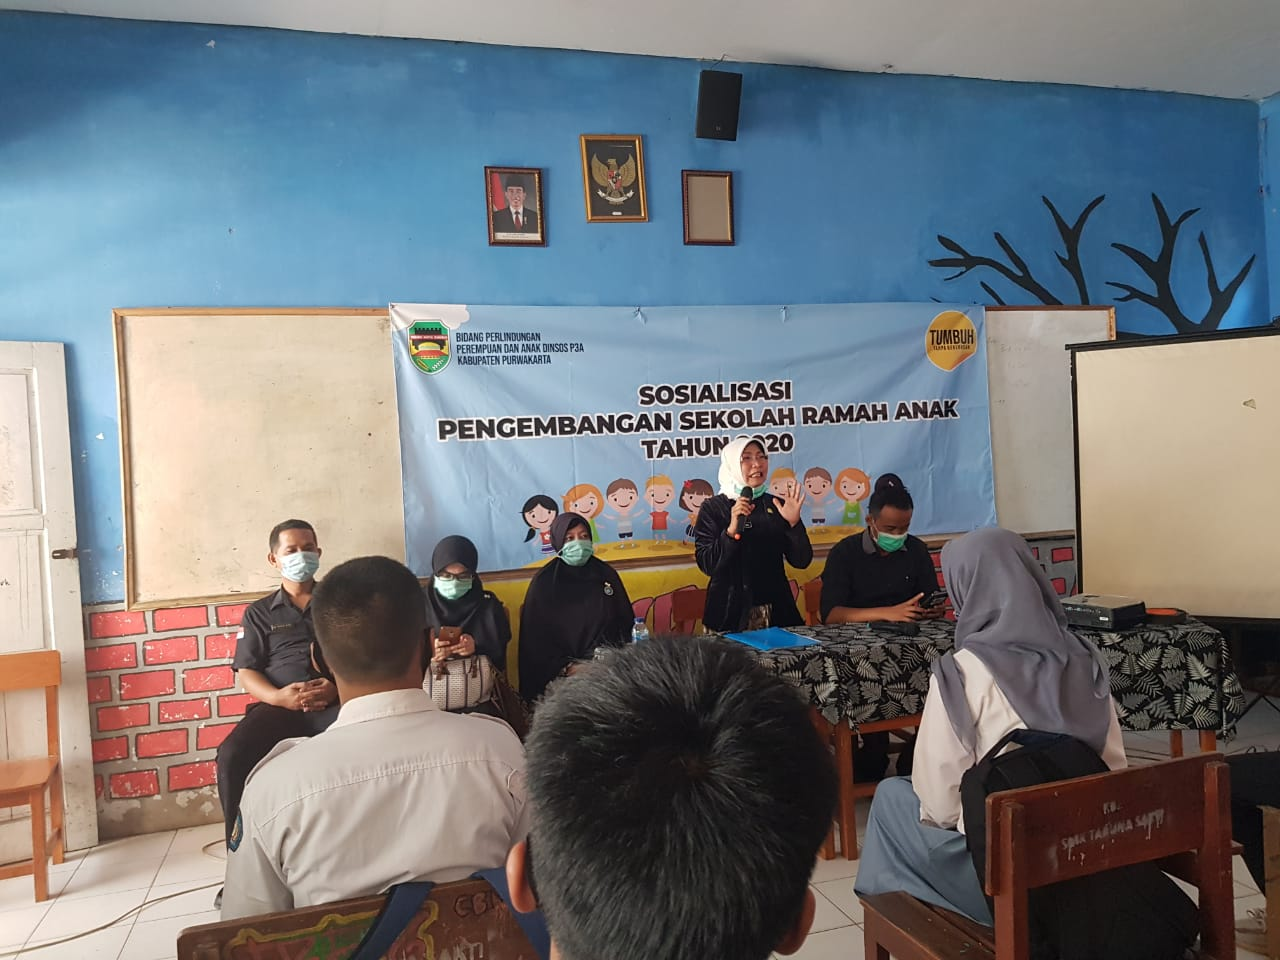 Dinsos P3A Kab.Purwakarta Sosialisasikan Pengembangan Sekolah Ramah Anak